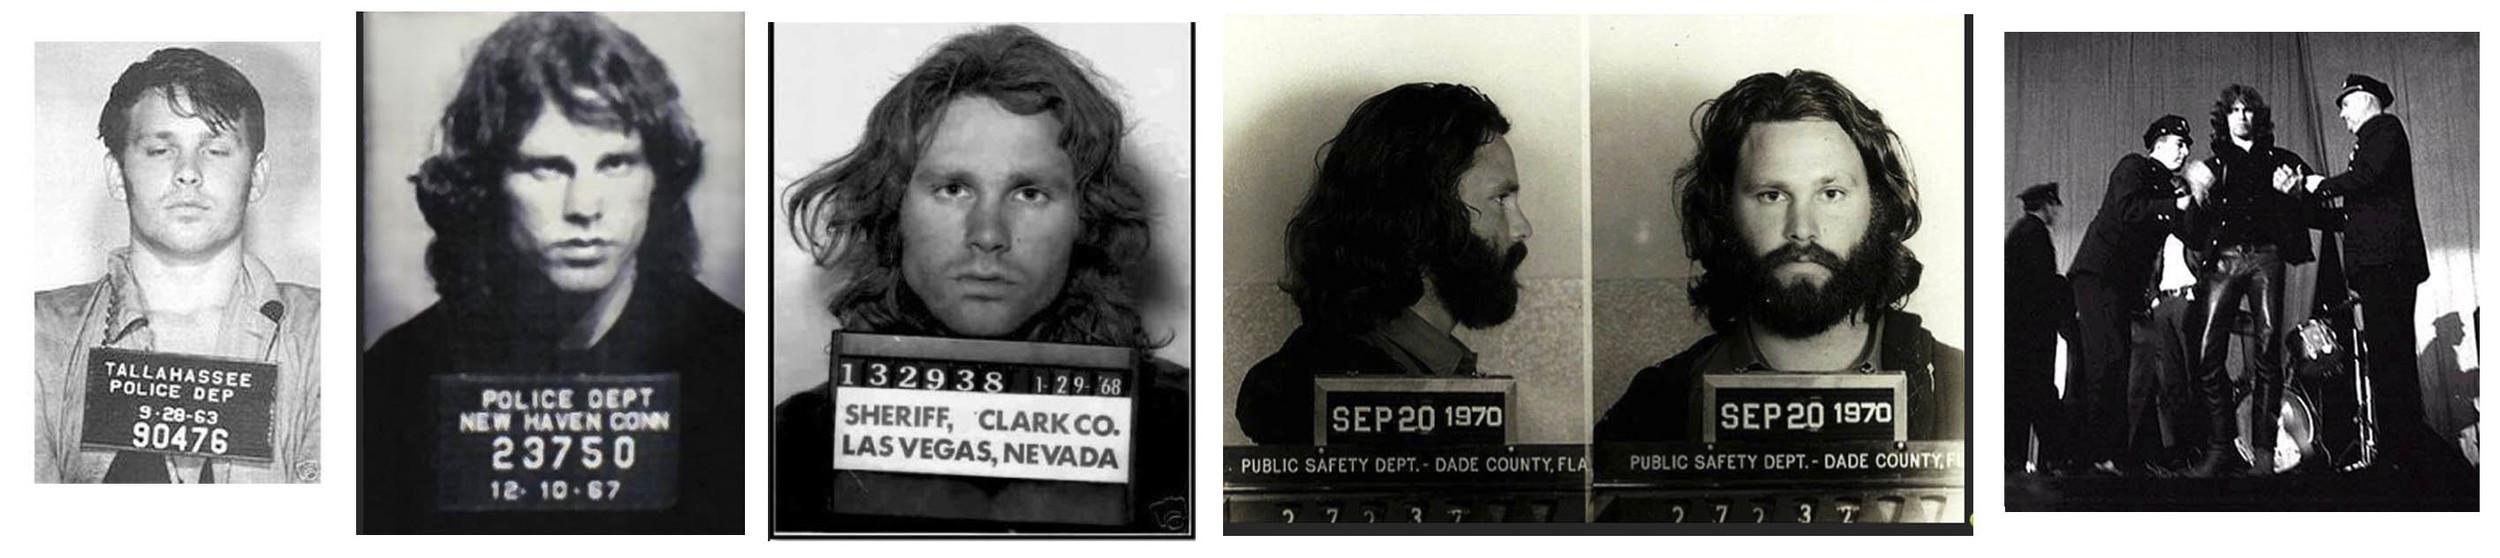 Jim Morrison, Sänger, The Doors.